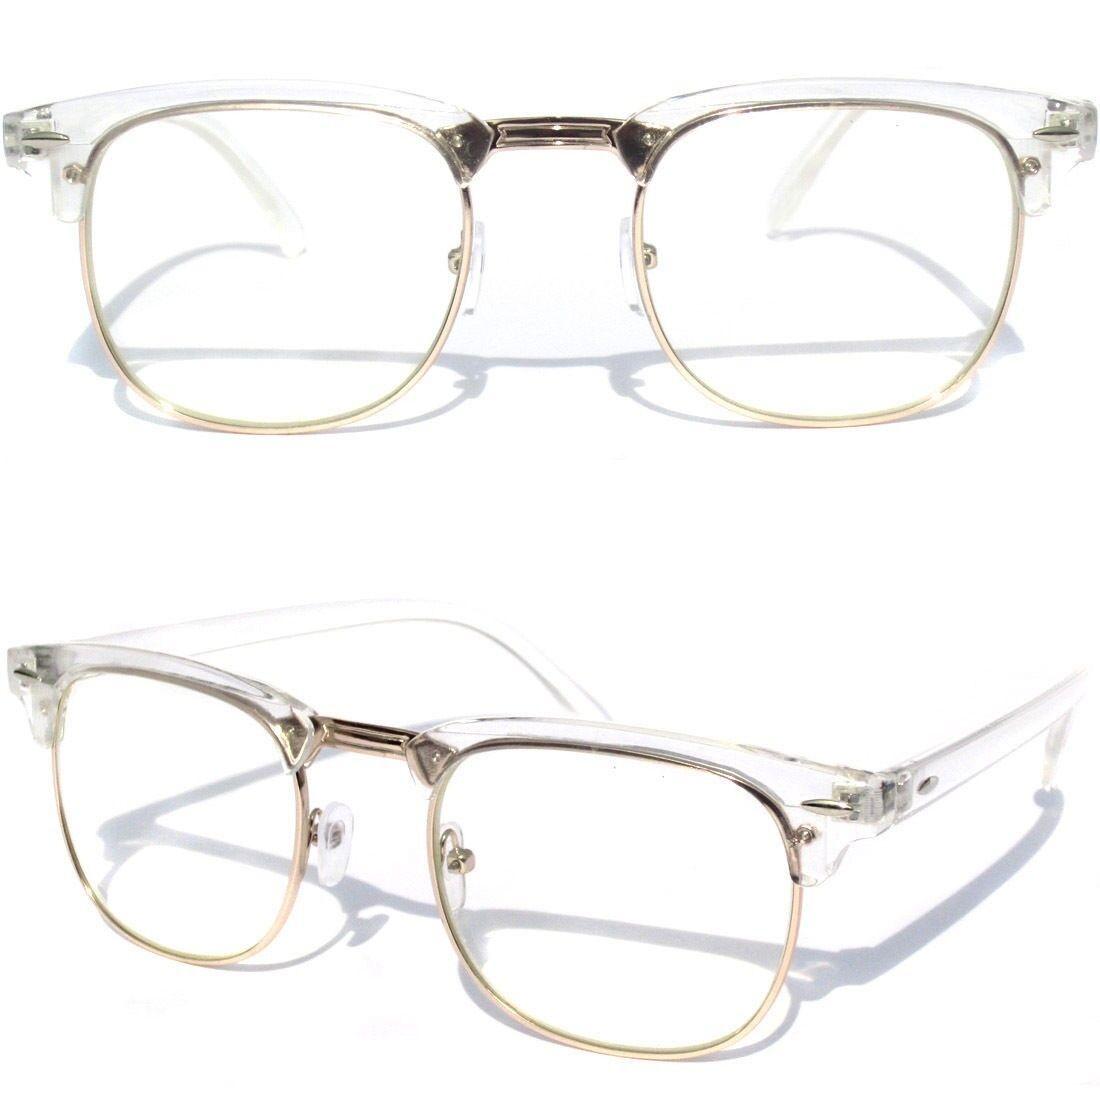 7e90329e78 Details about Men s or Women Half Frame Clear Lens EYE GLASSES Transparent  Crystal Half Top